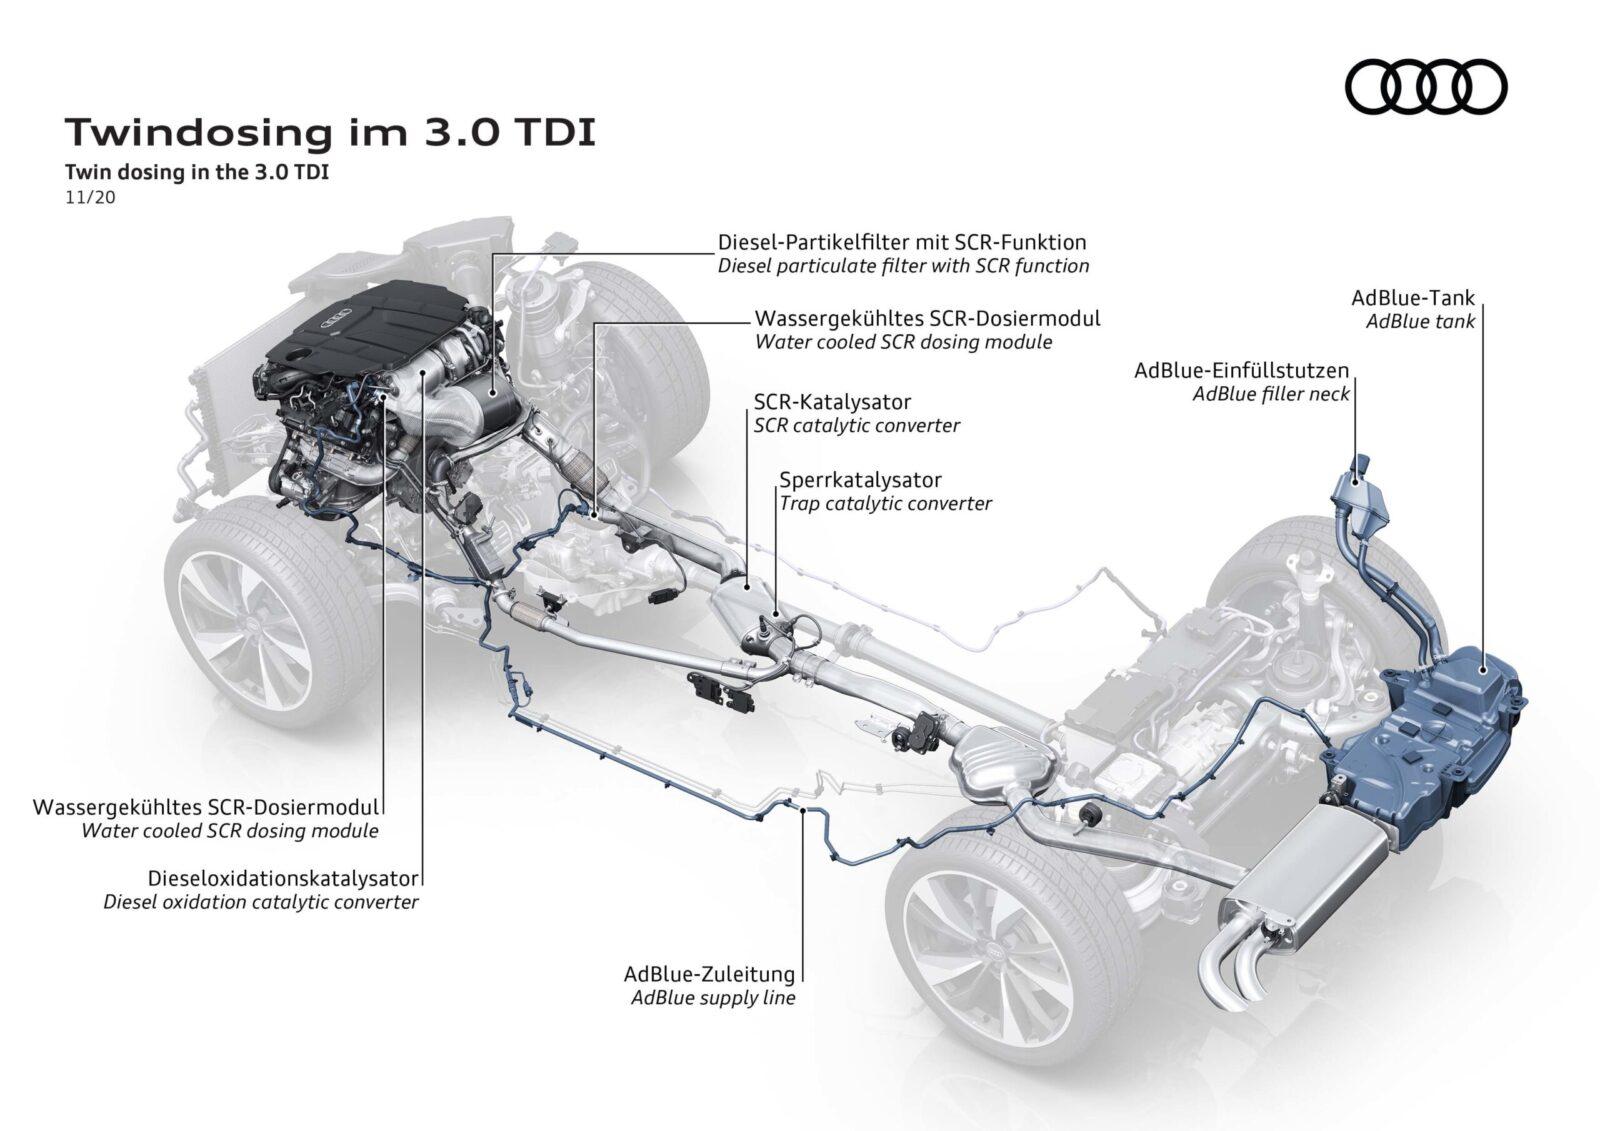 Il V6 TDI 3.0 di Audi